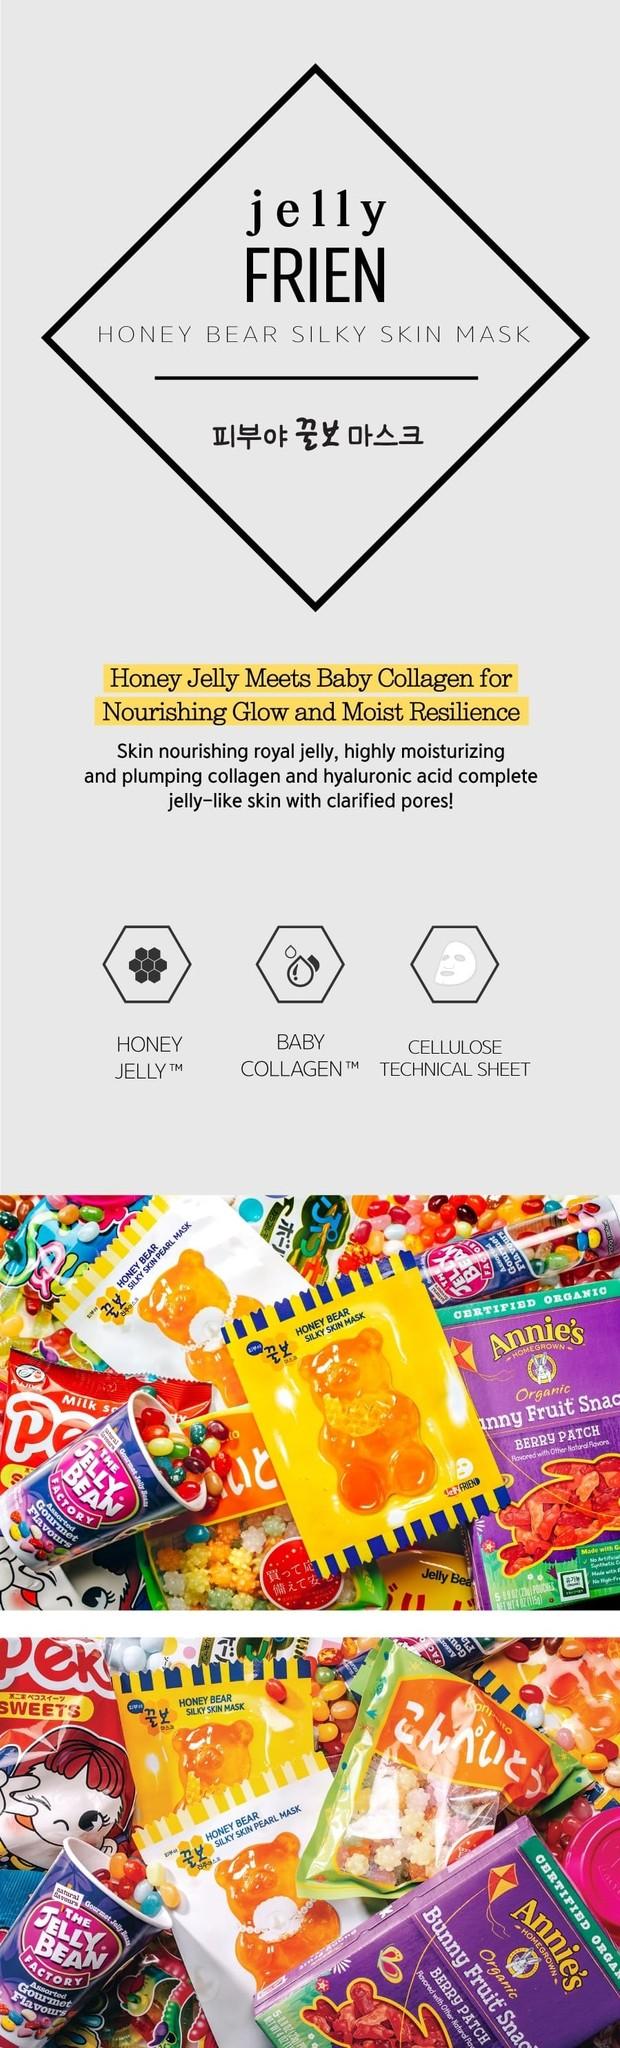 Honey Bear Silky Skin Mask-3